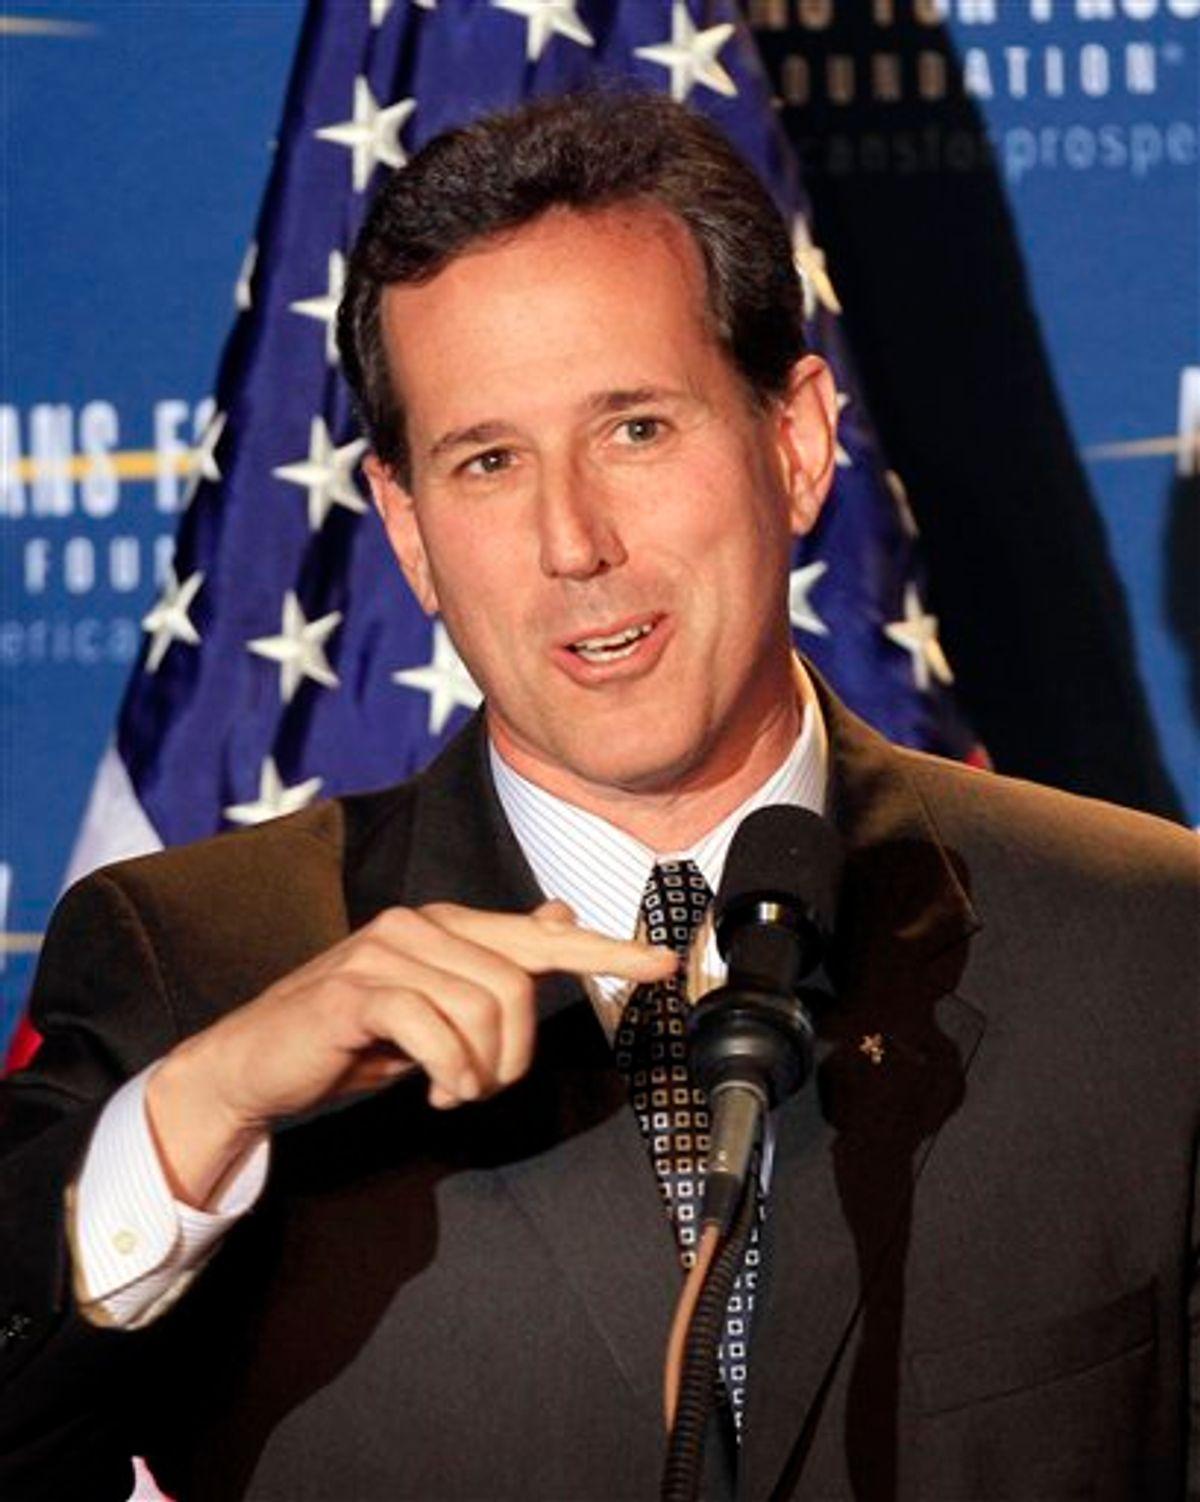 Possible 2012 presidential hopeful, former Republican U.S. Sen., Rick Santorum of Pennsylvania speaks during a dinner sponsored by Americans for Prosperity, Friday, April 29, 2011 in Manchester , N.H. (AP Photo/Jim Cole) (AP)